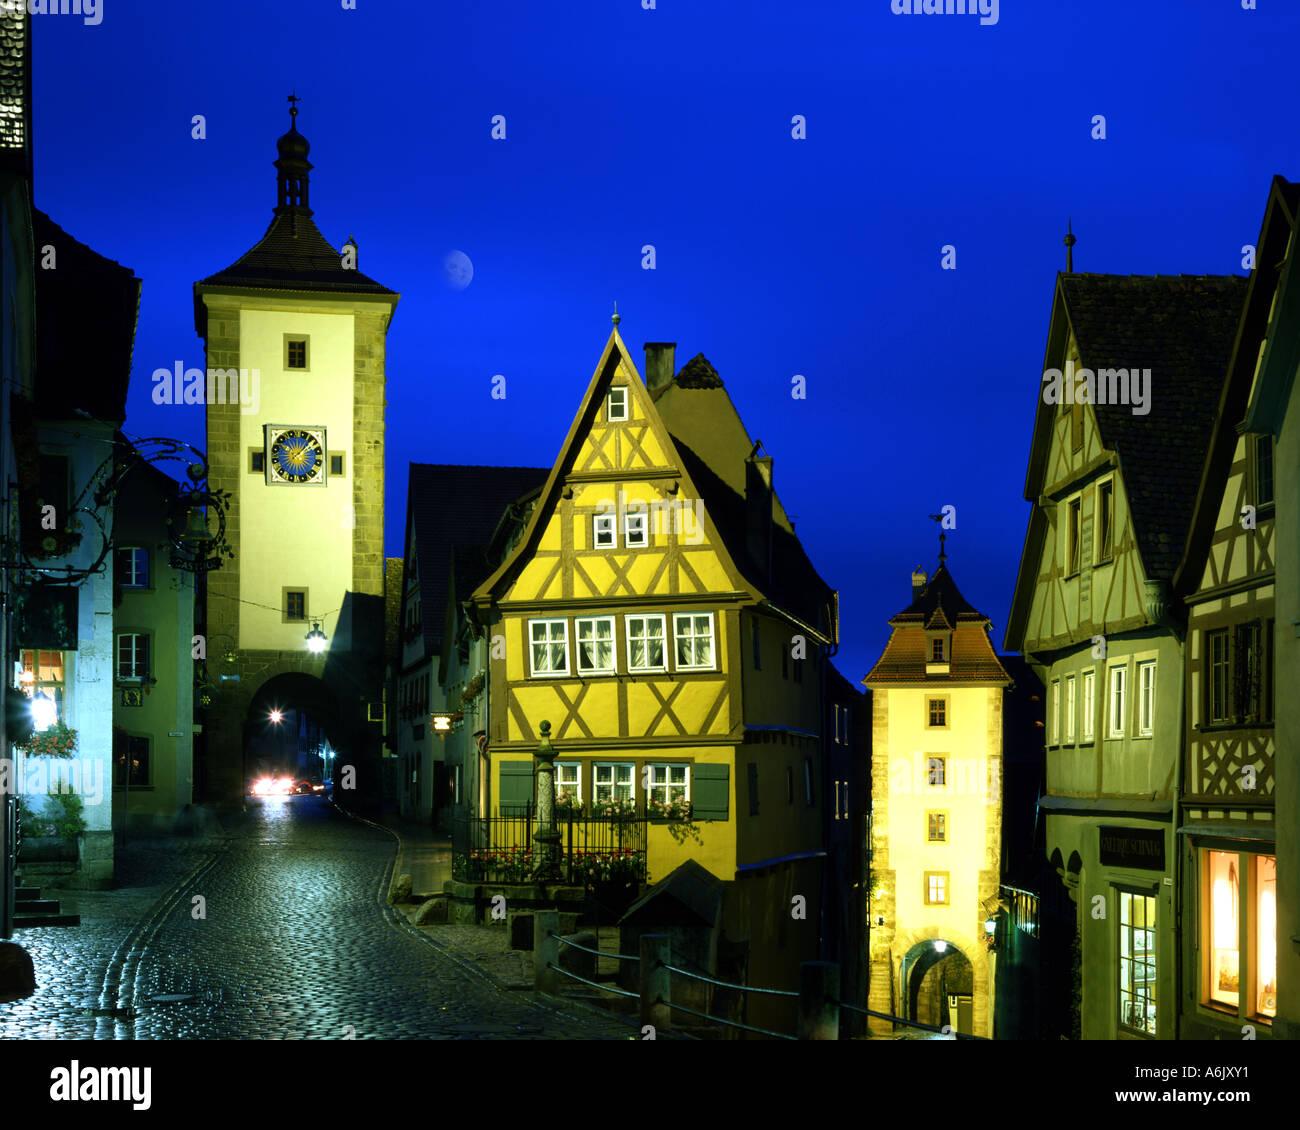 DE - BAVARIA:  The Plönlein Gate at Rothenburg-ob-der-Tauber - Stock Image